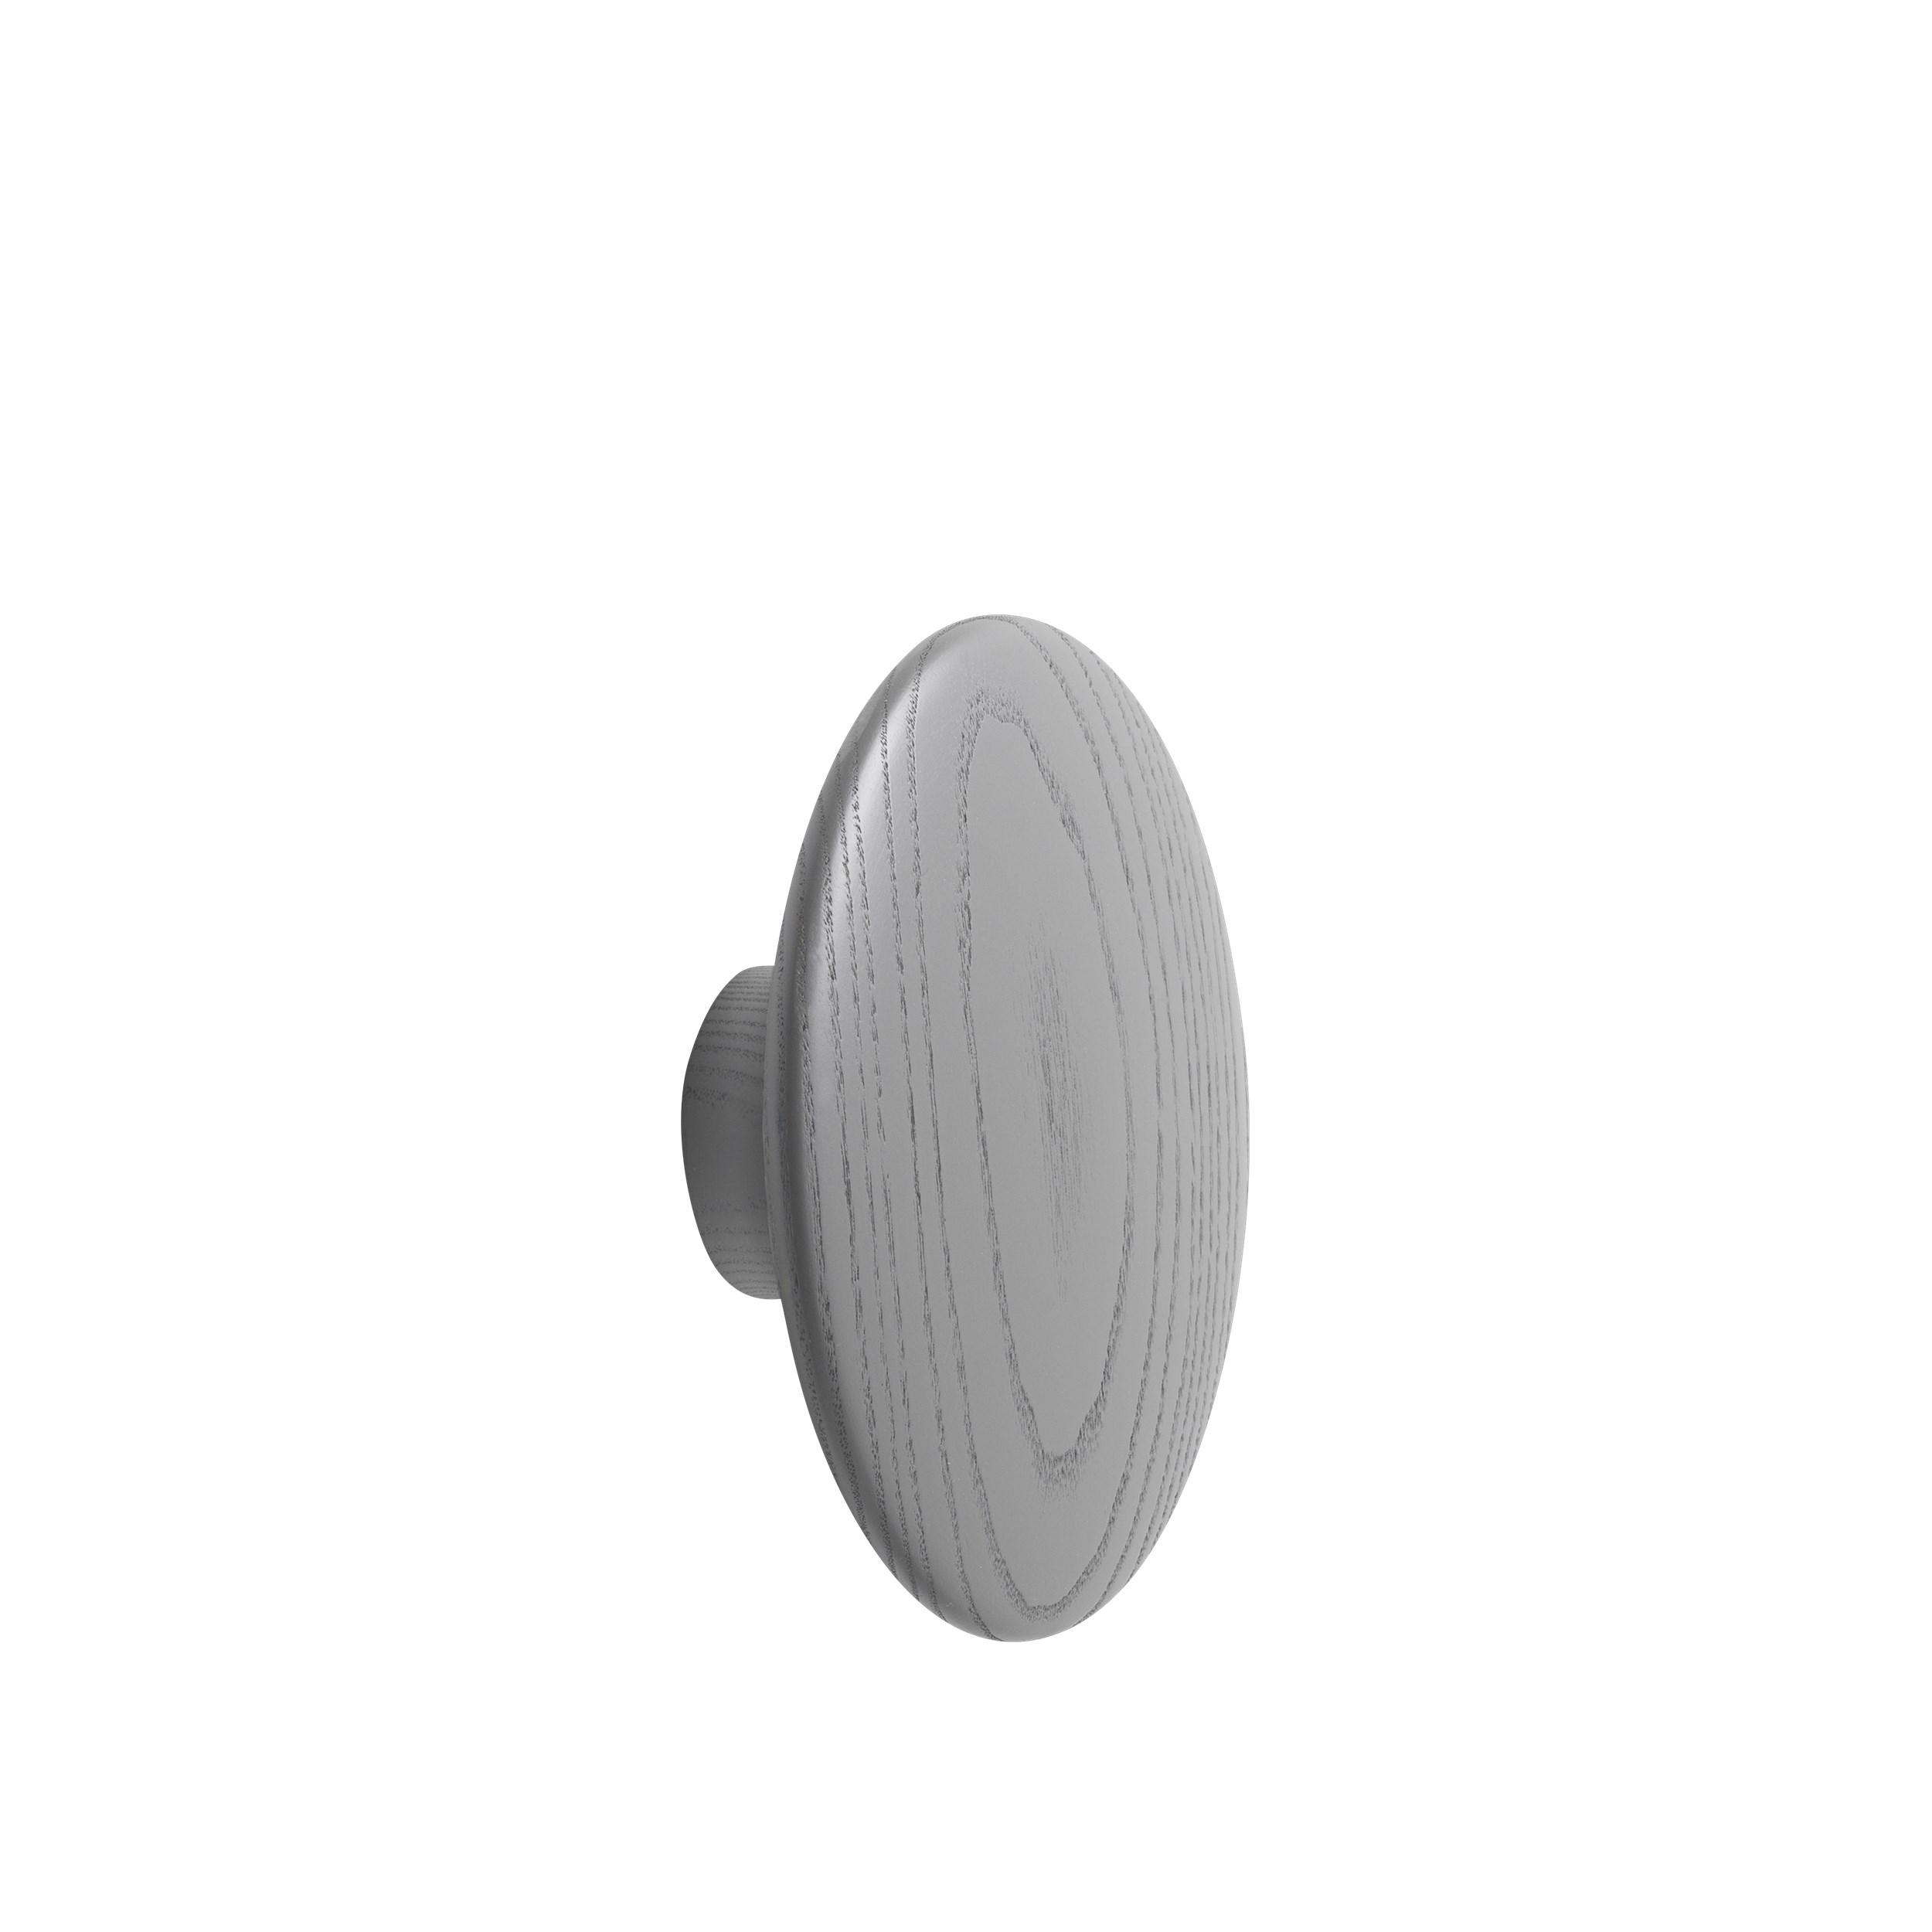 Dot wood large Ø 17 cm dark grey